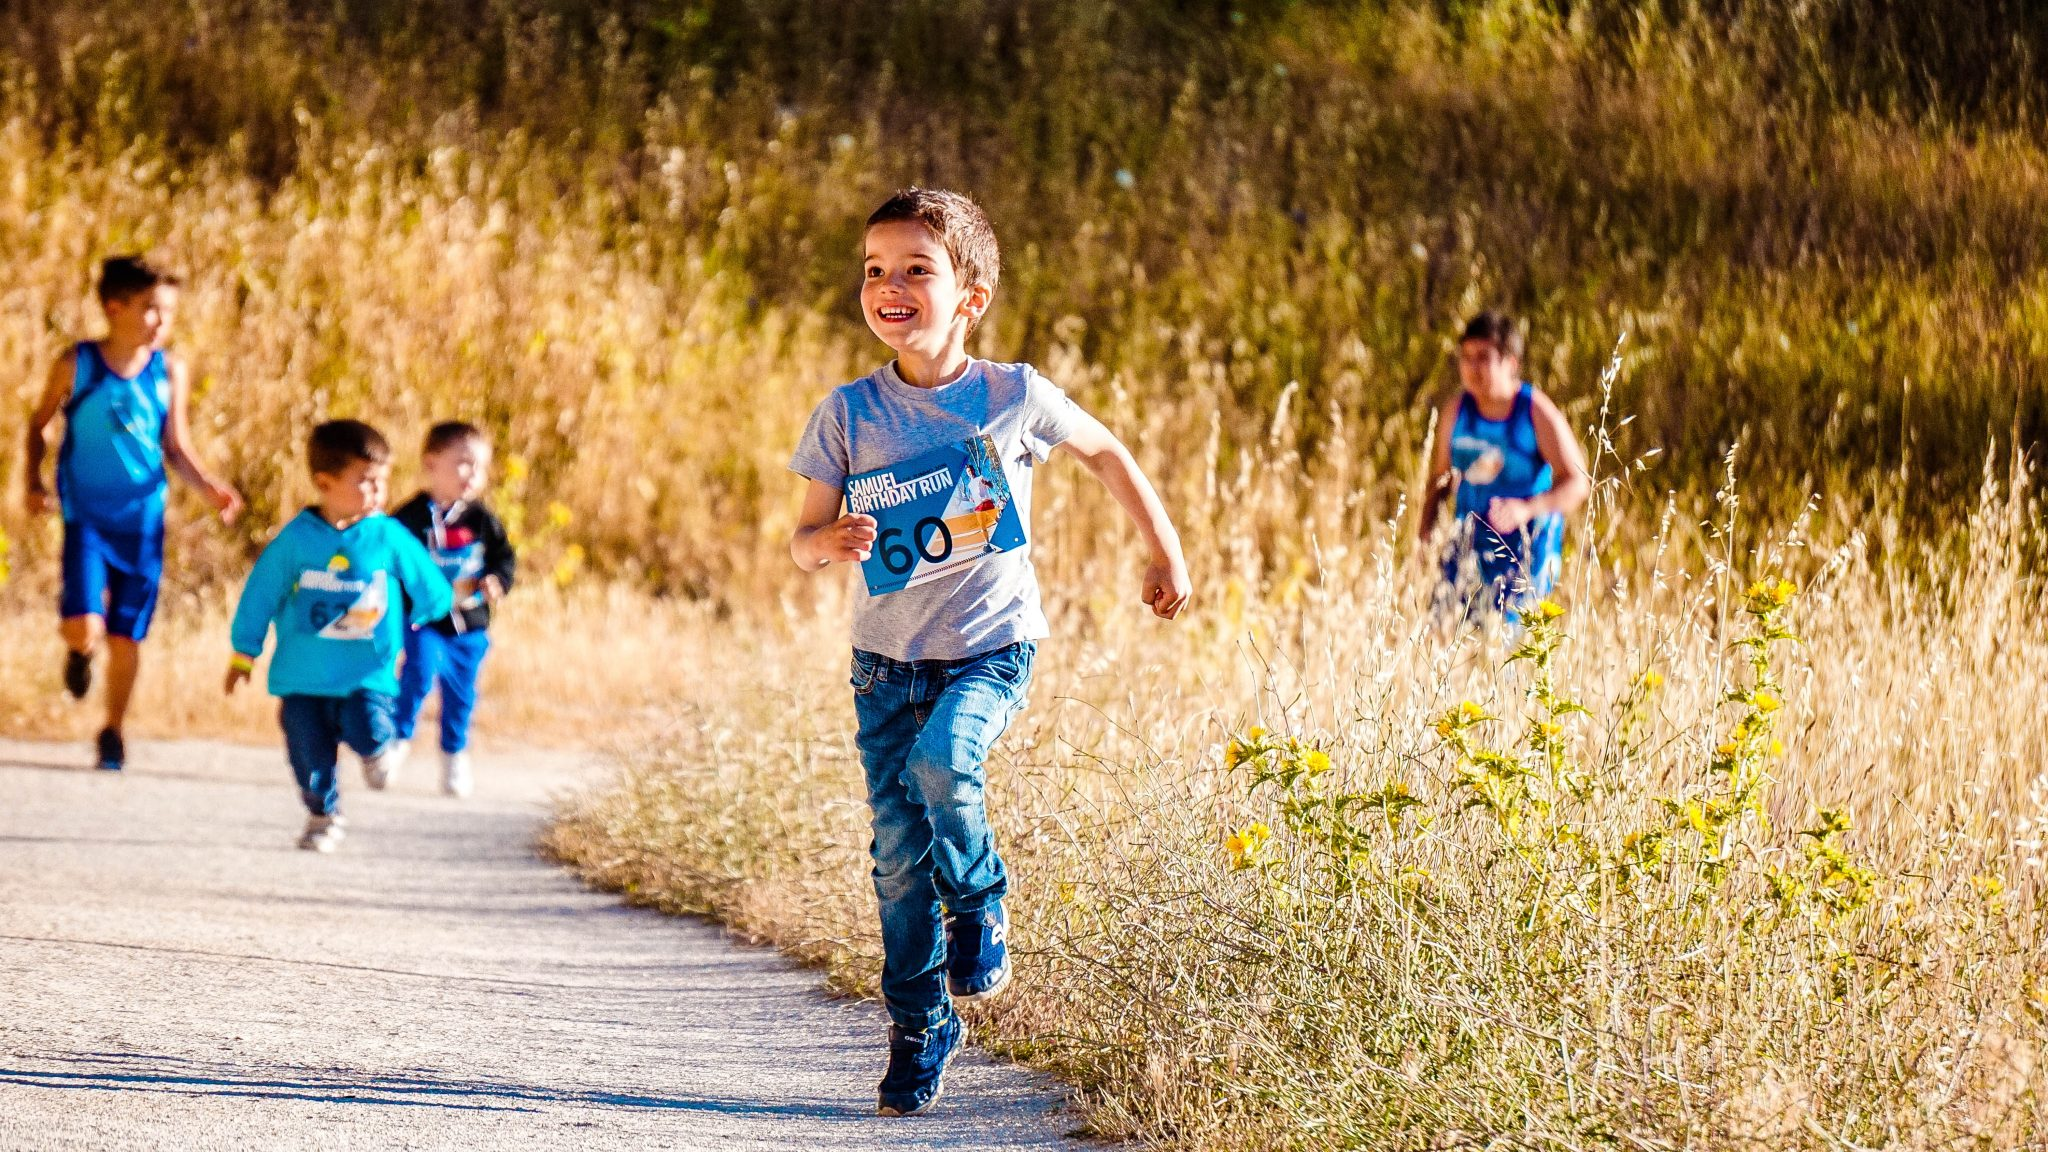 boy running on path